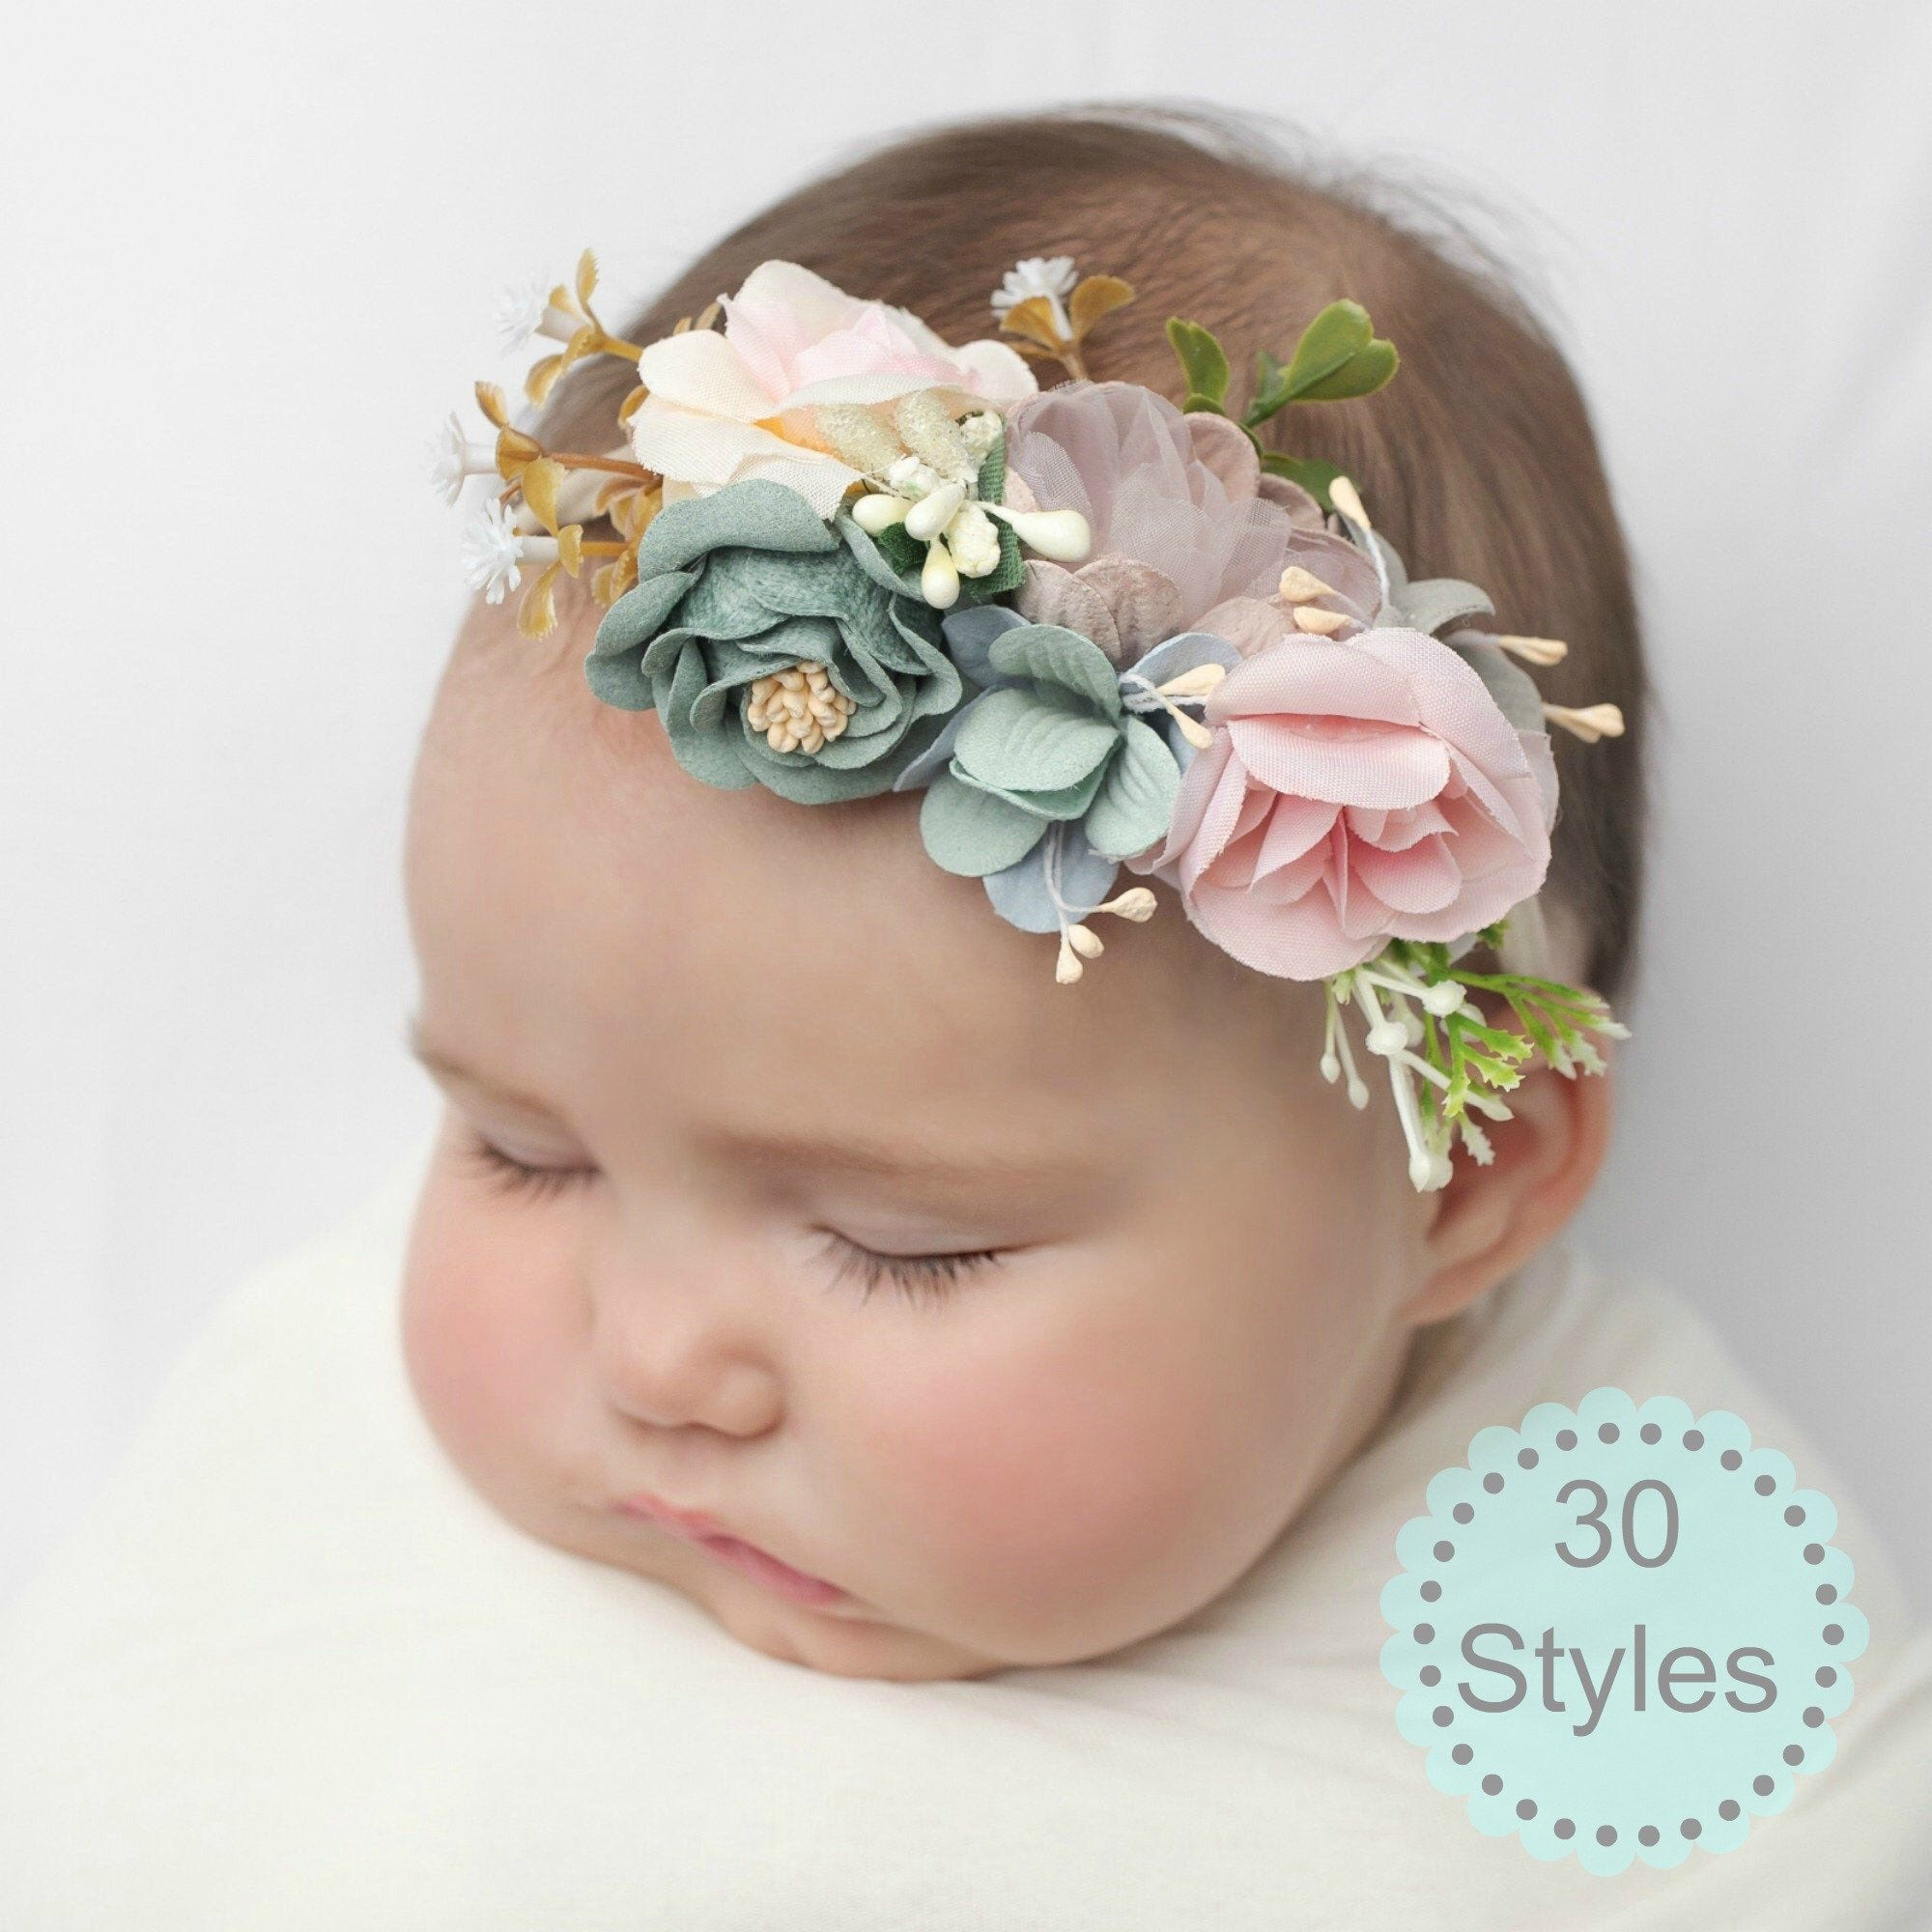 Baby Headband Flower Headband Flower Crown Floral Crown Baby Toddler Headband Flower Girl Headband Photo Prop Baby Gift Nylon Headband